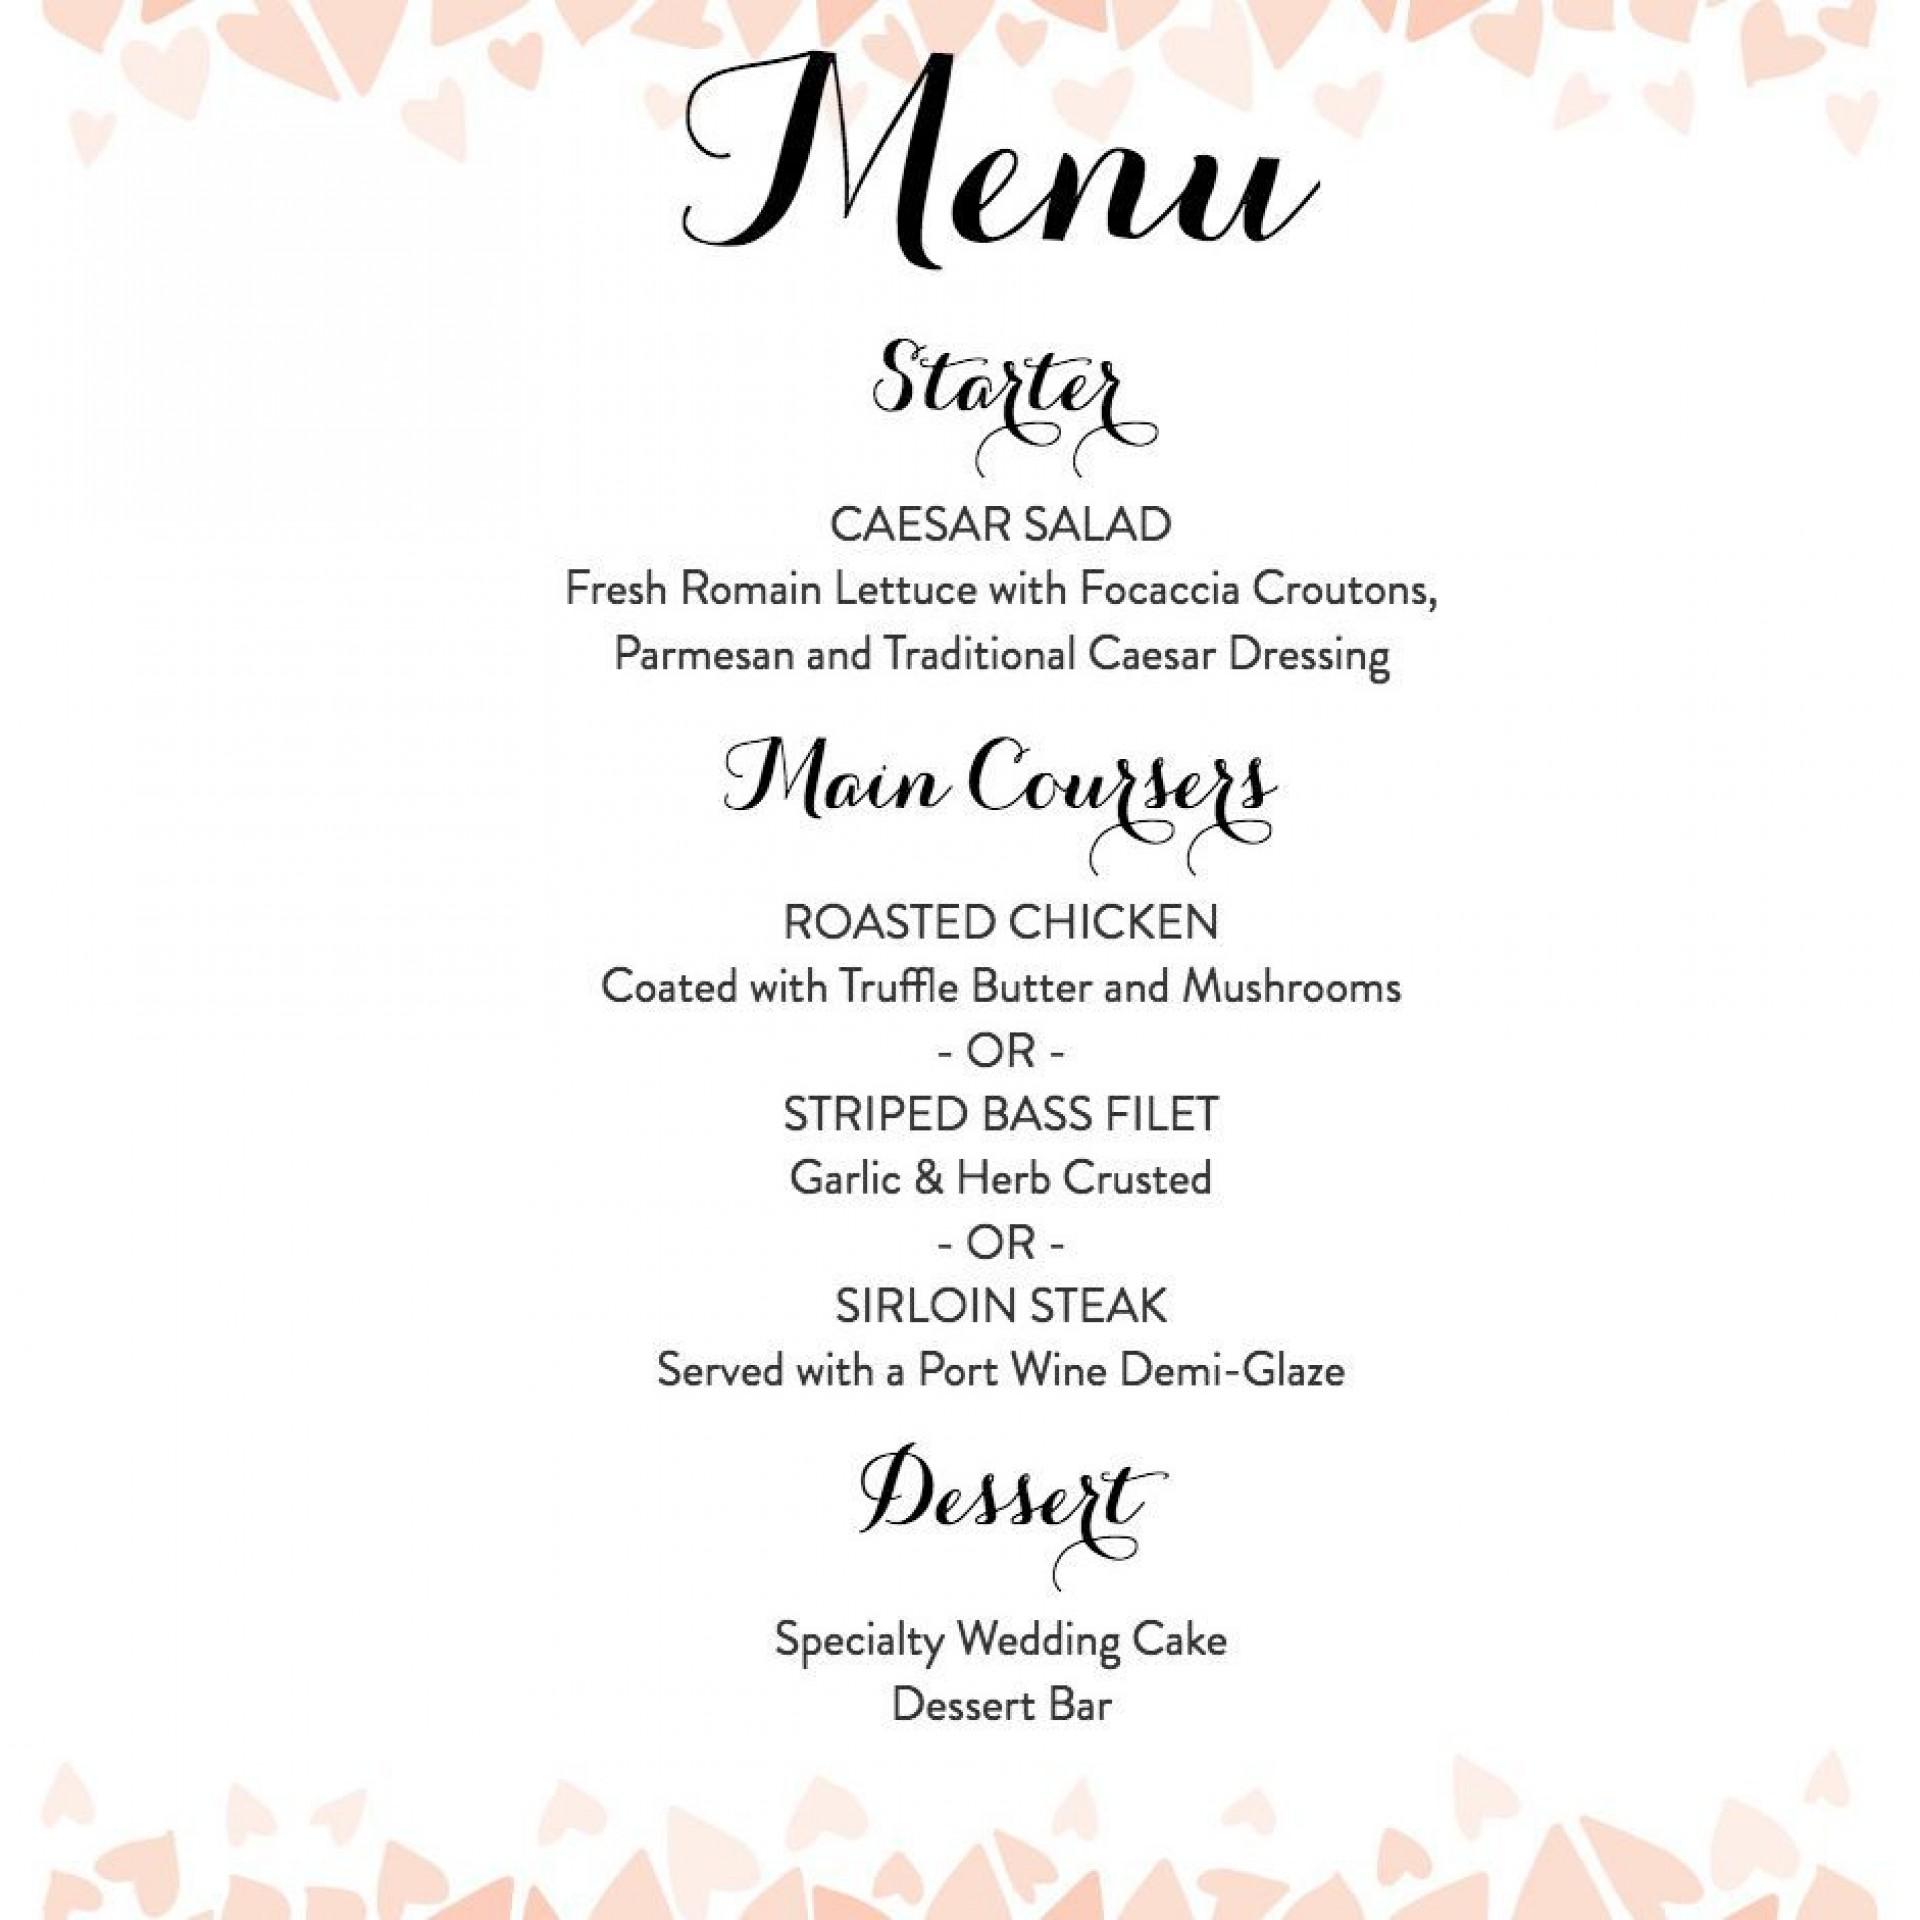 008 Beautiful Free Wedding Menu Template Design  Templates Printable For Mac1920